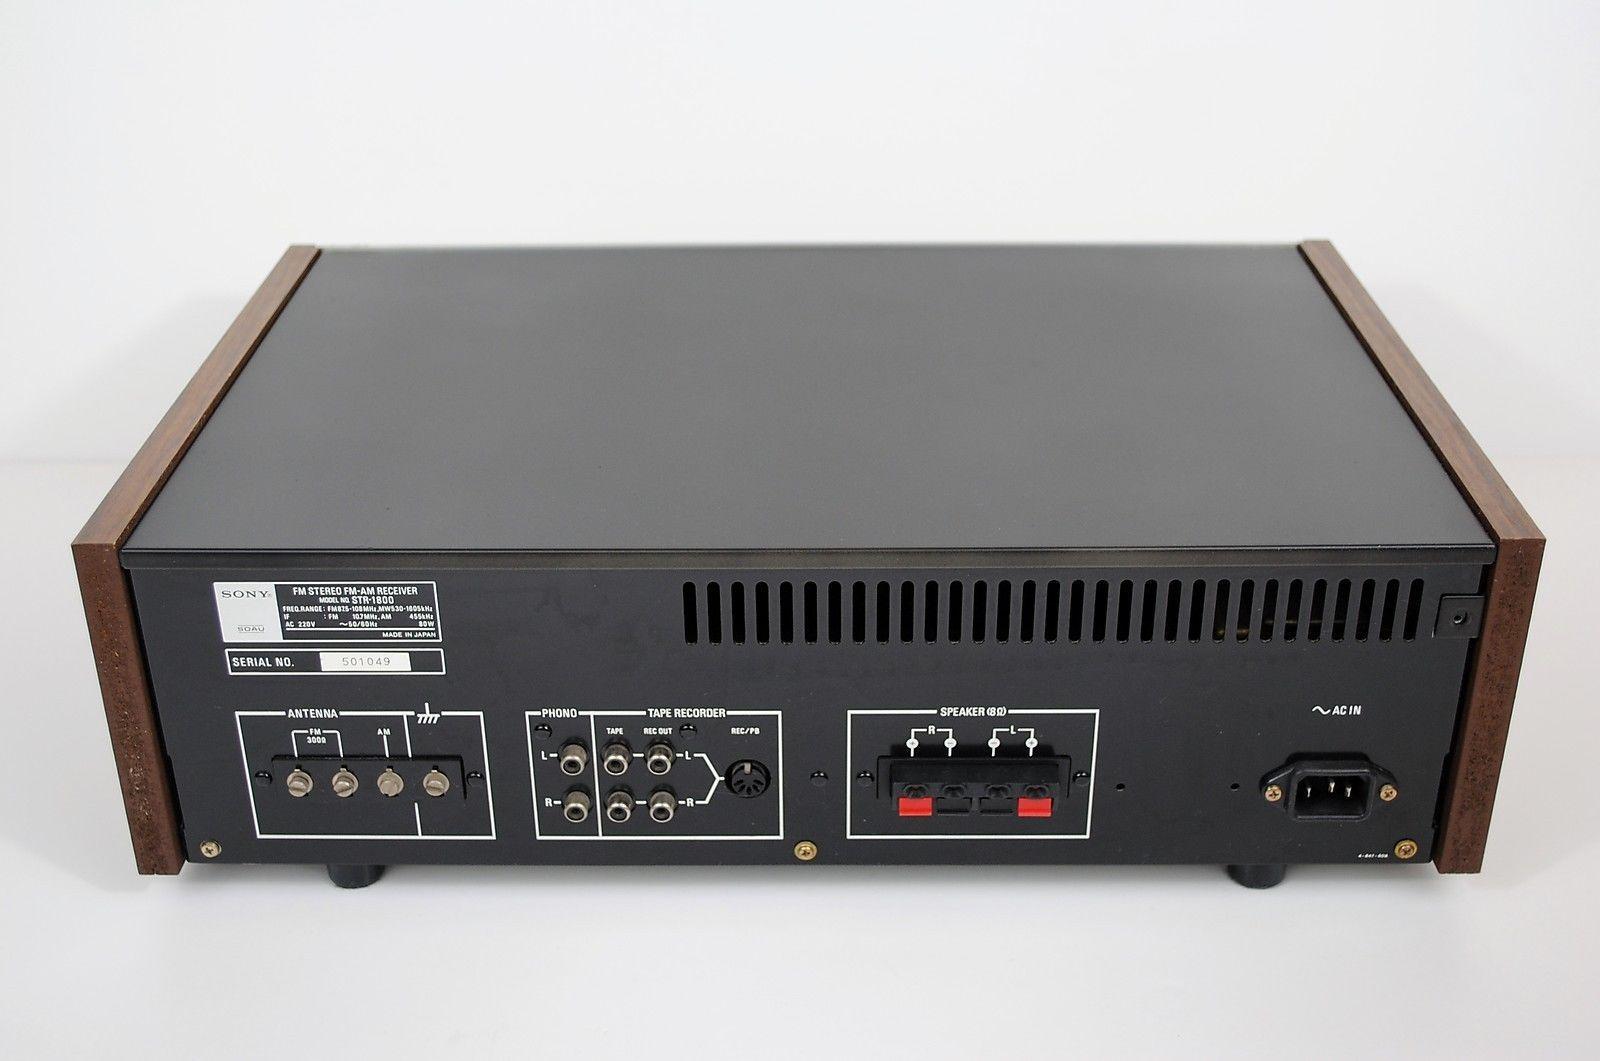 Vintage Sony STR-1800 AM/FM Stereo Receiver 1970's in Sound